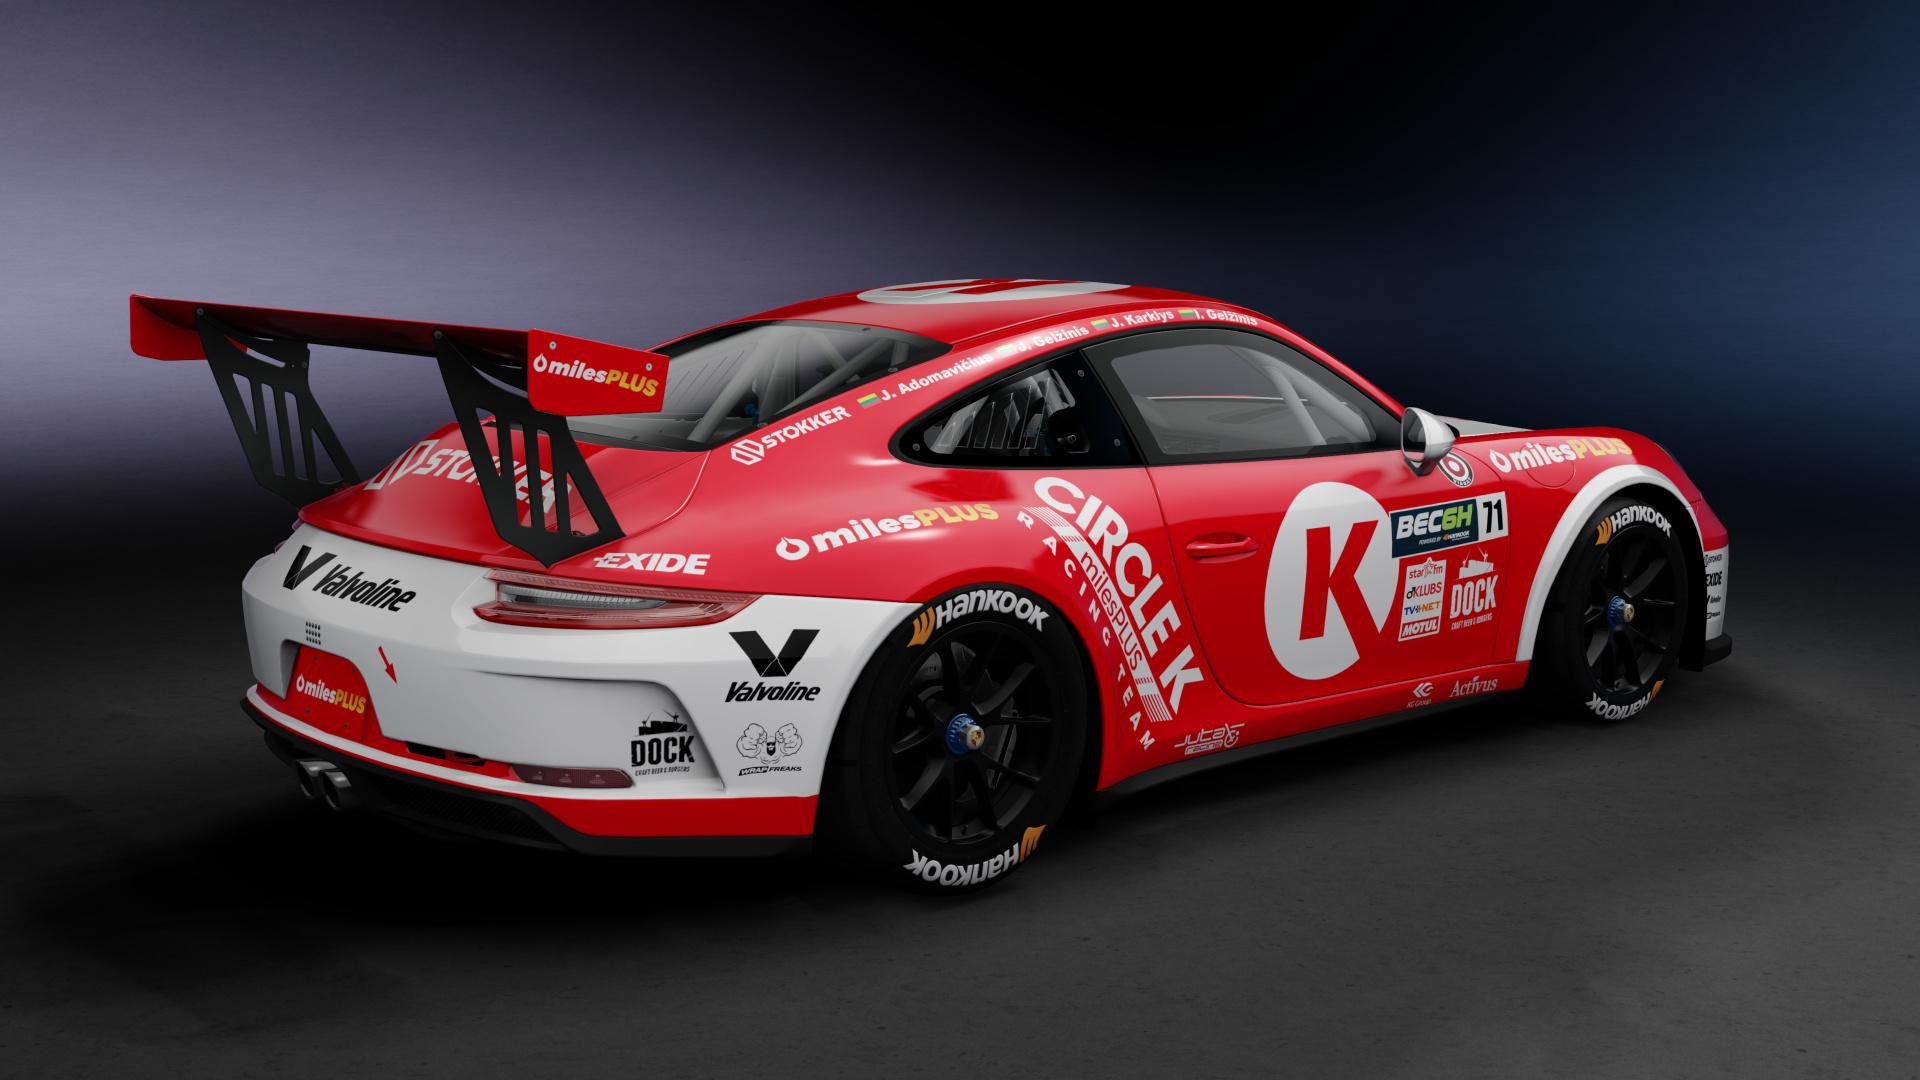 Porsche 911 Gt3 Cup Circle K Racedepartment